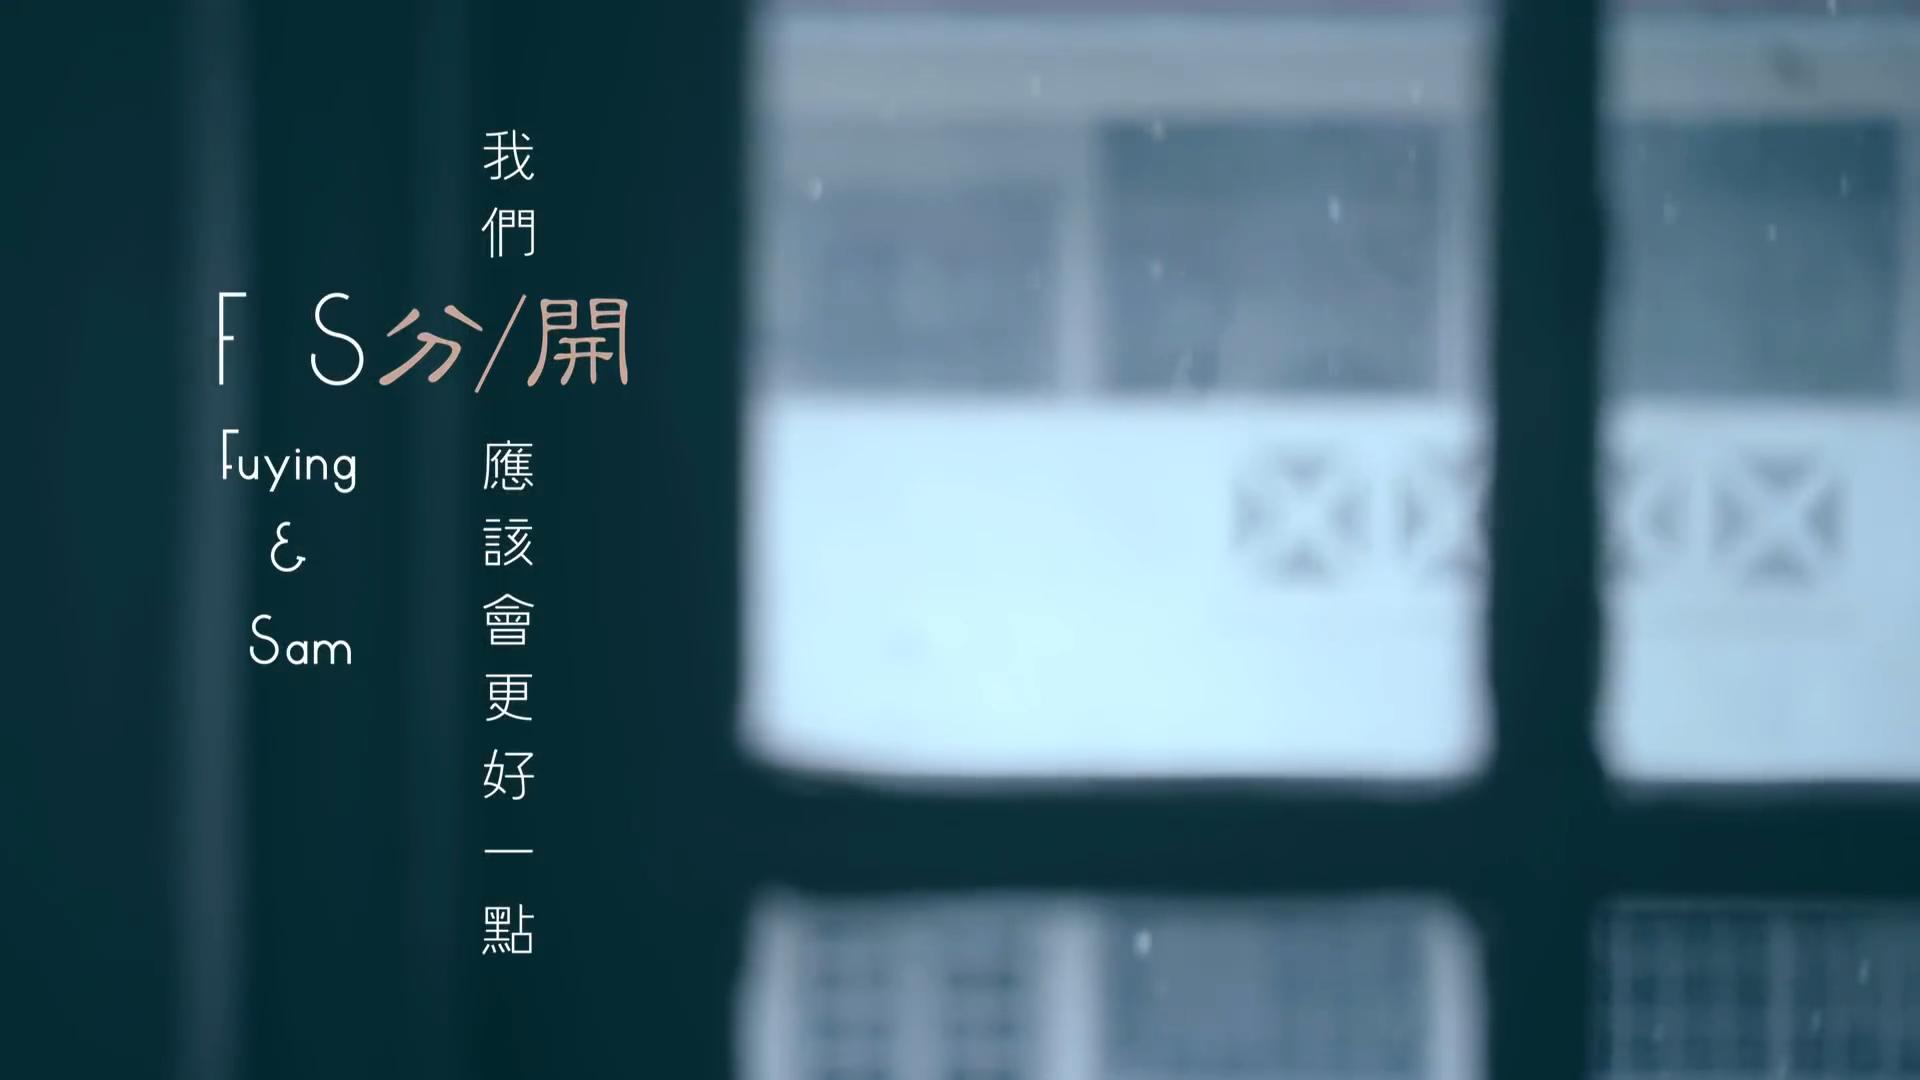 FS (Fuying & Sam)【我們分開應該會更好一點 】Official MV